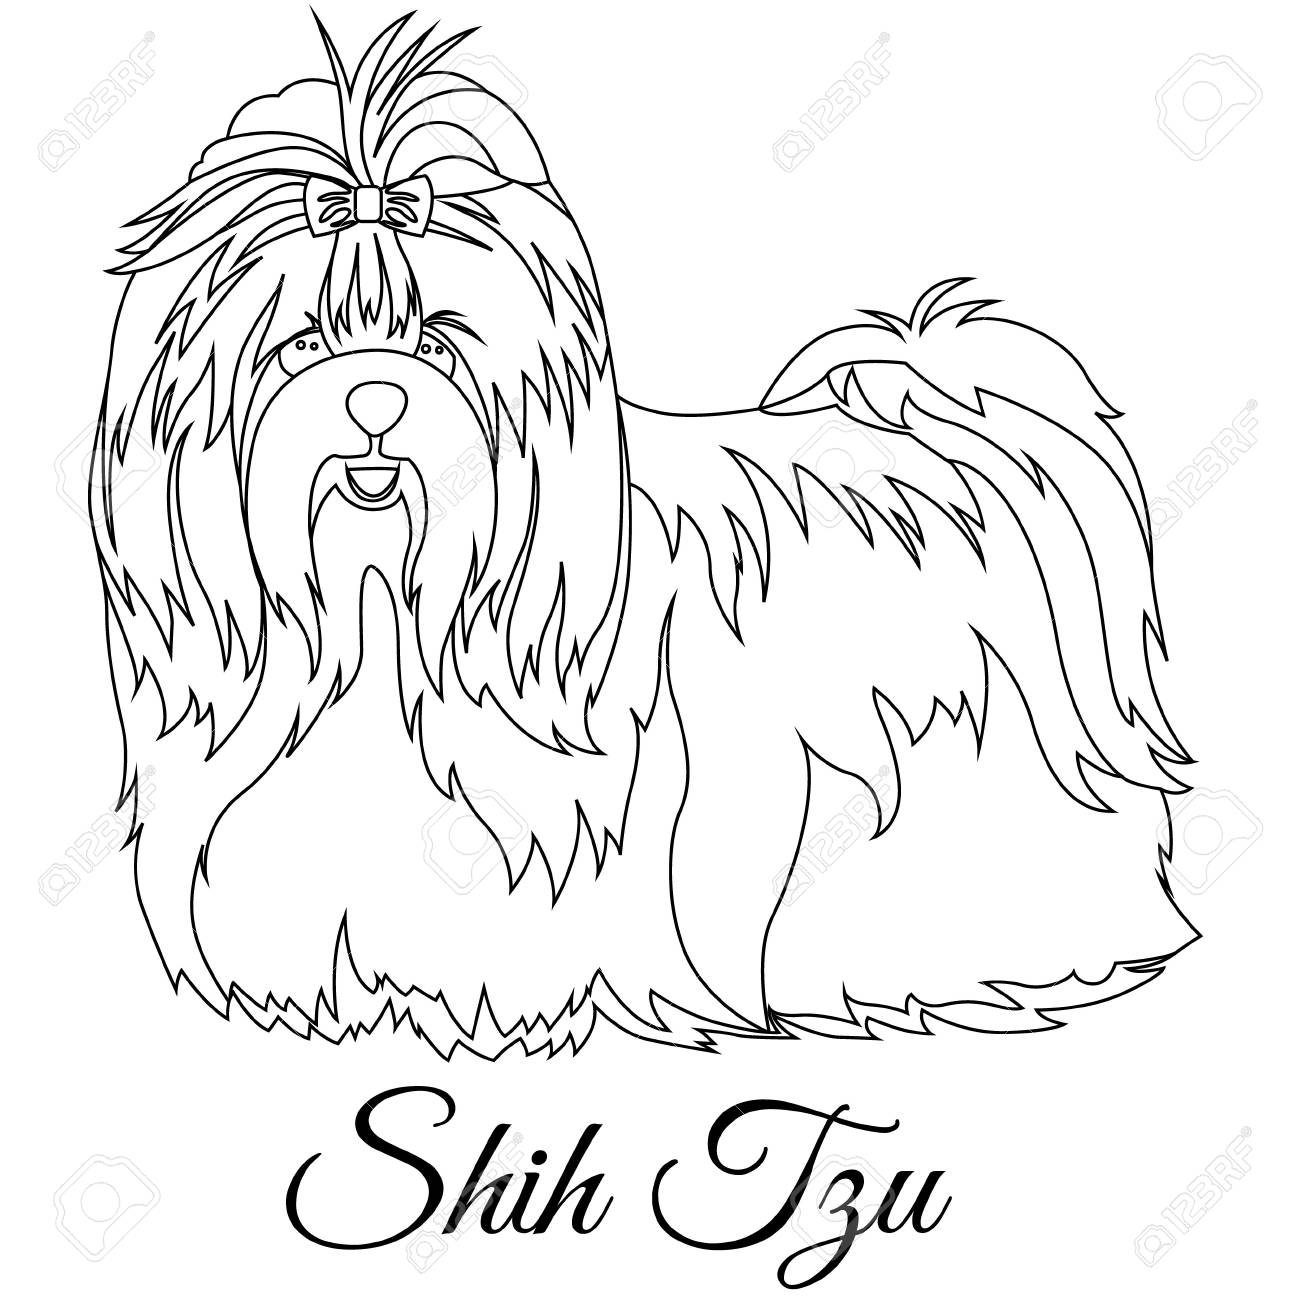 Shih Tzu Outline On White Background Vector Illustration Royalty